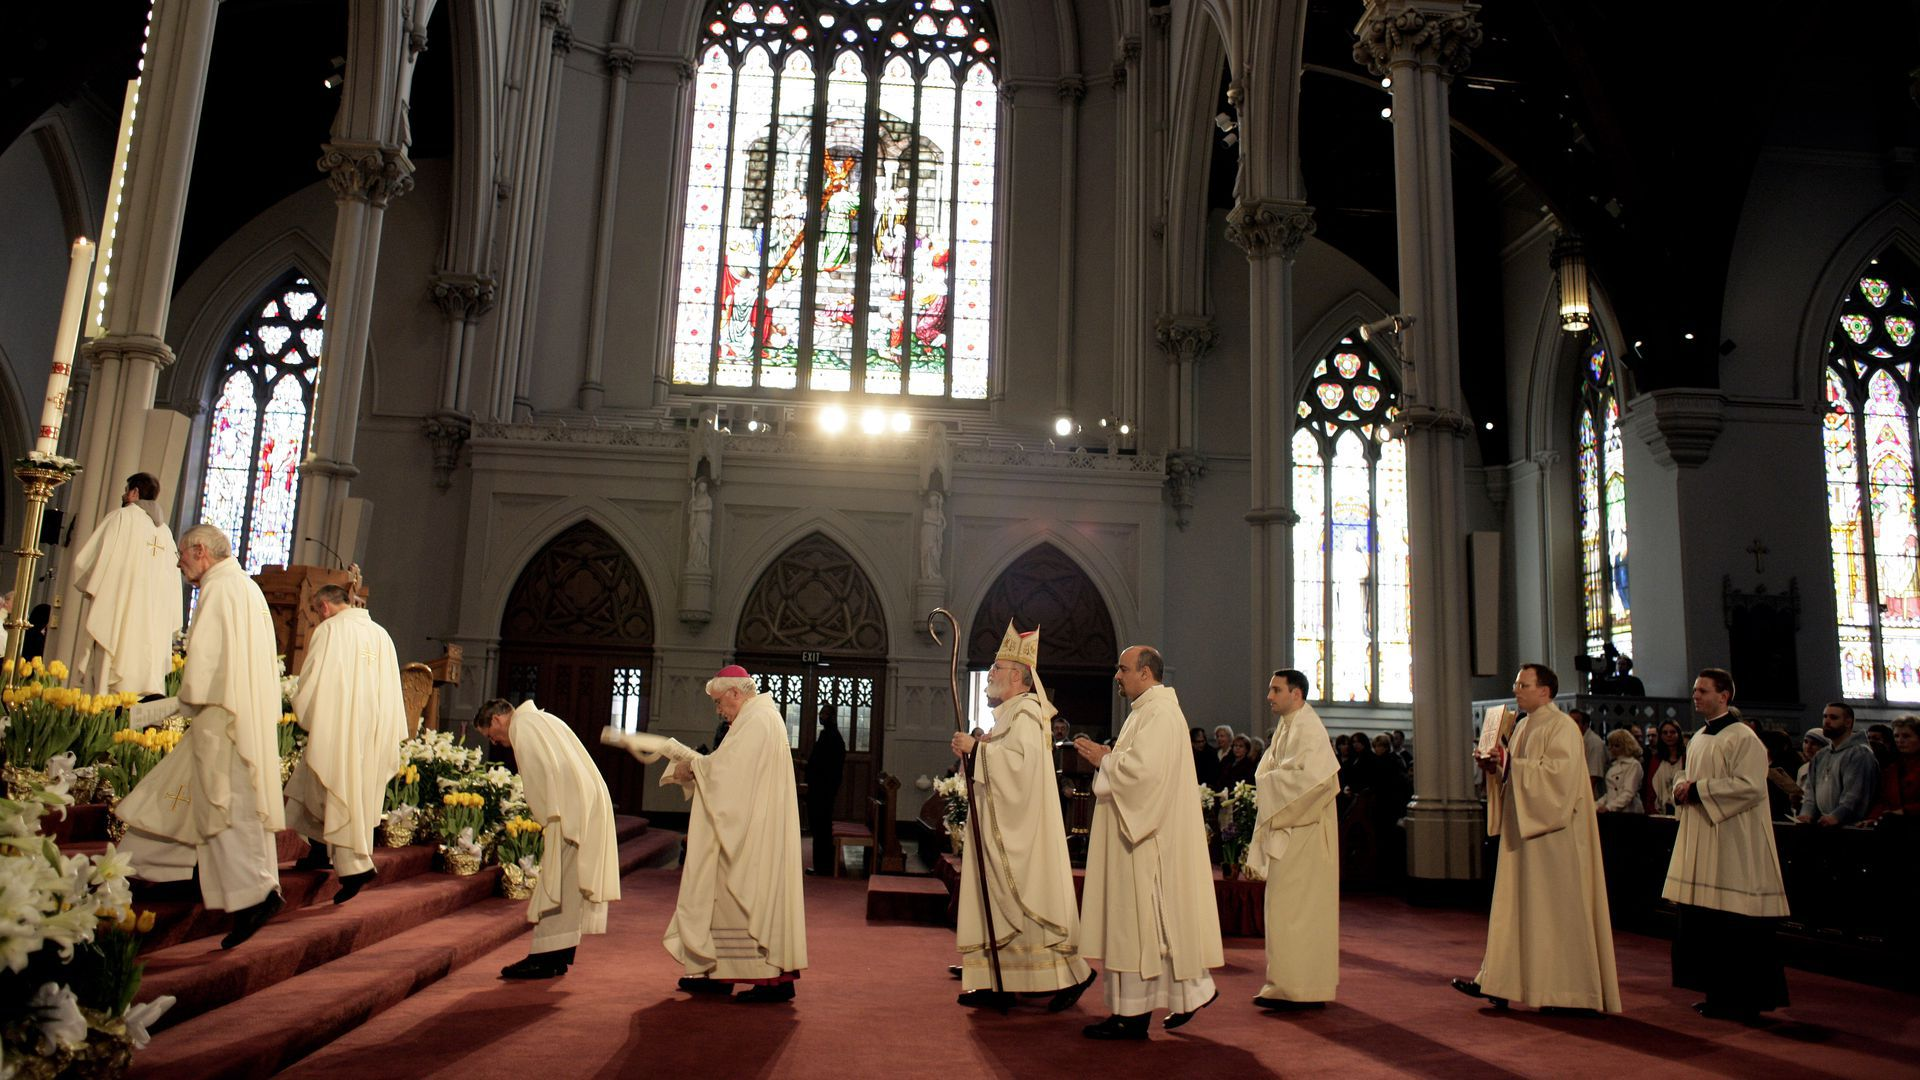 Priests inside a church